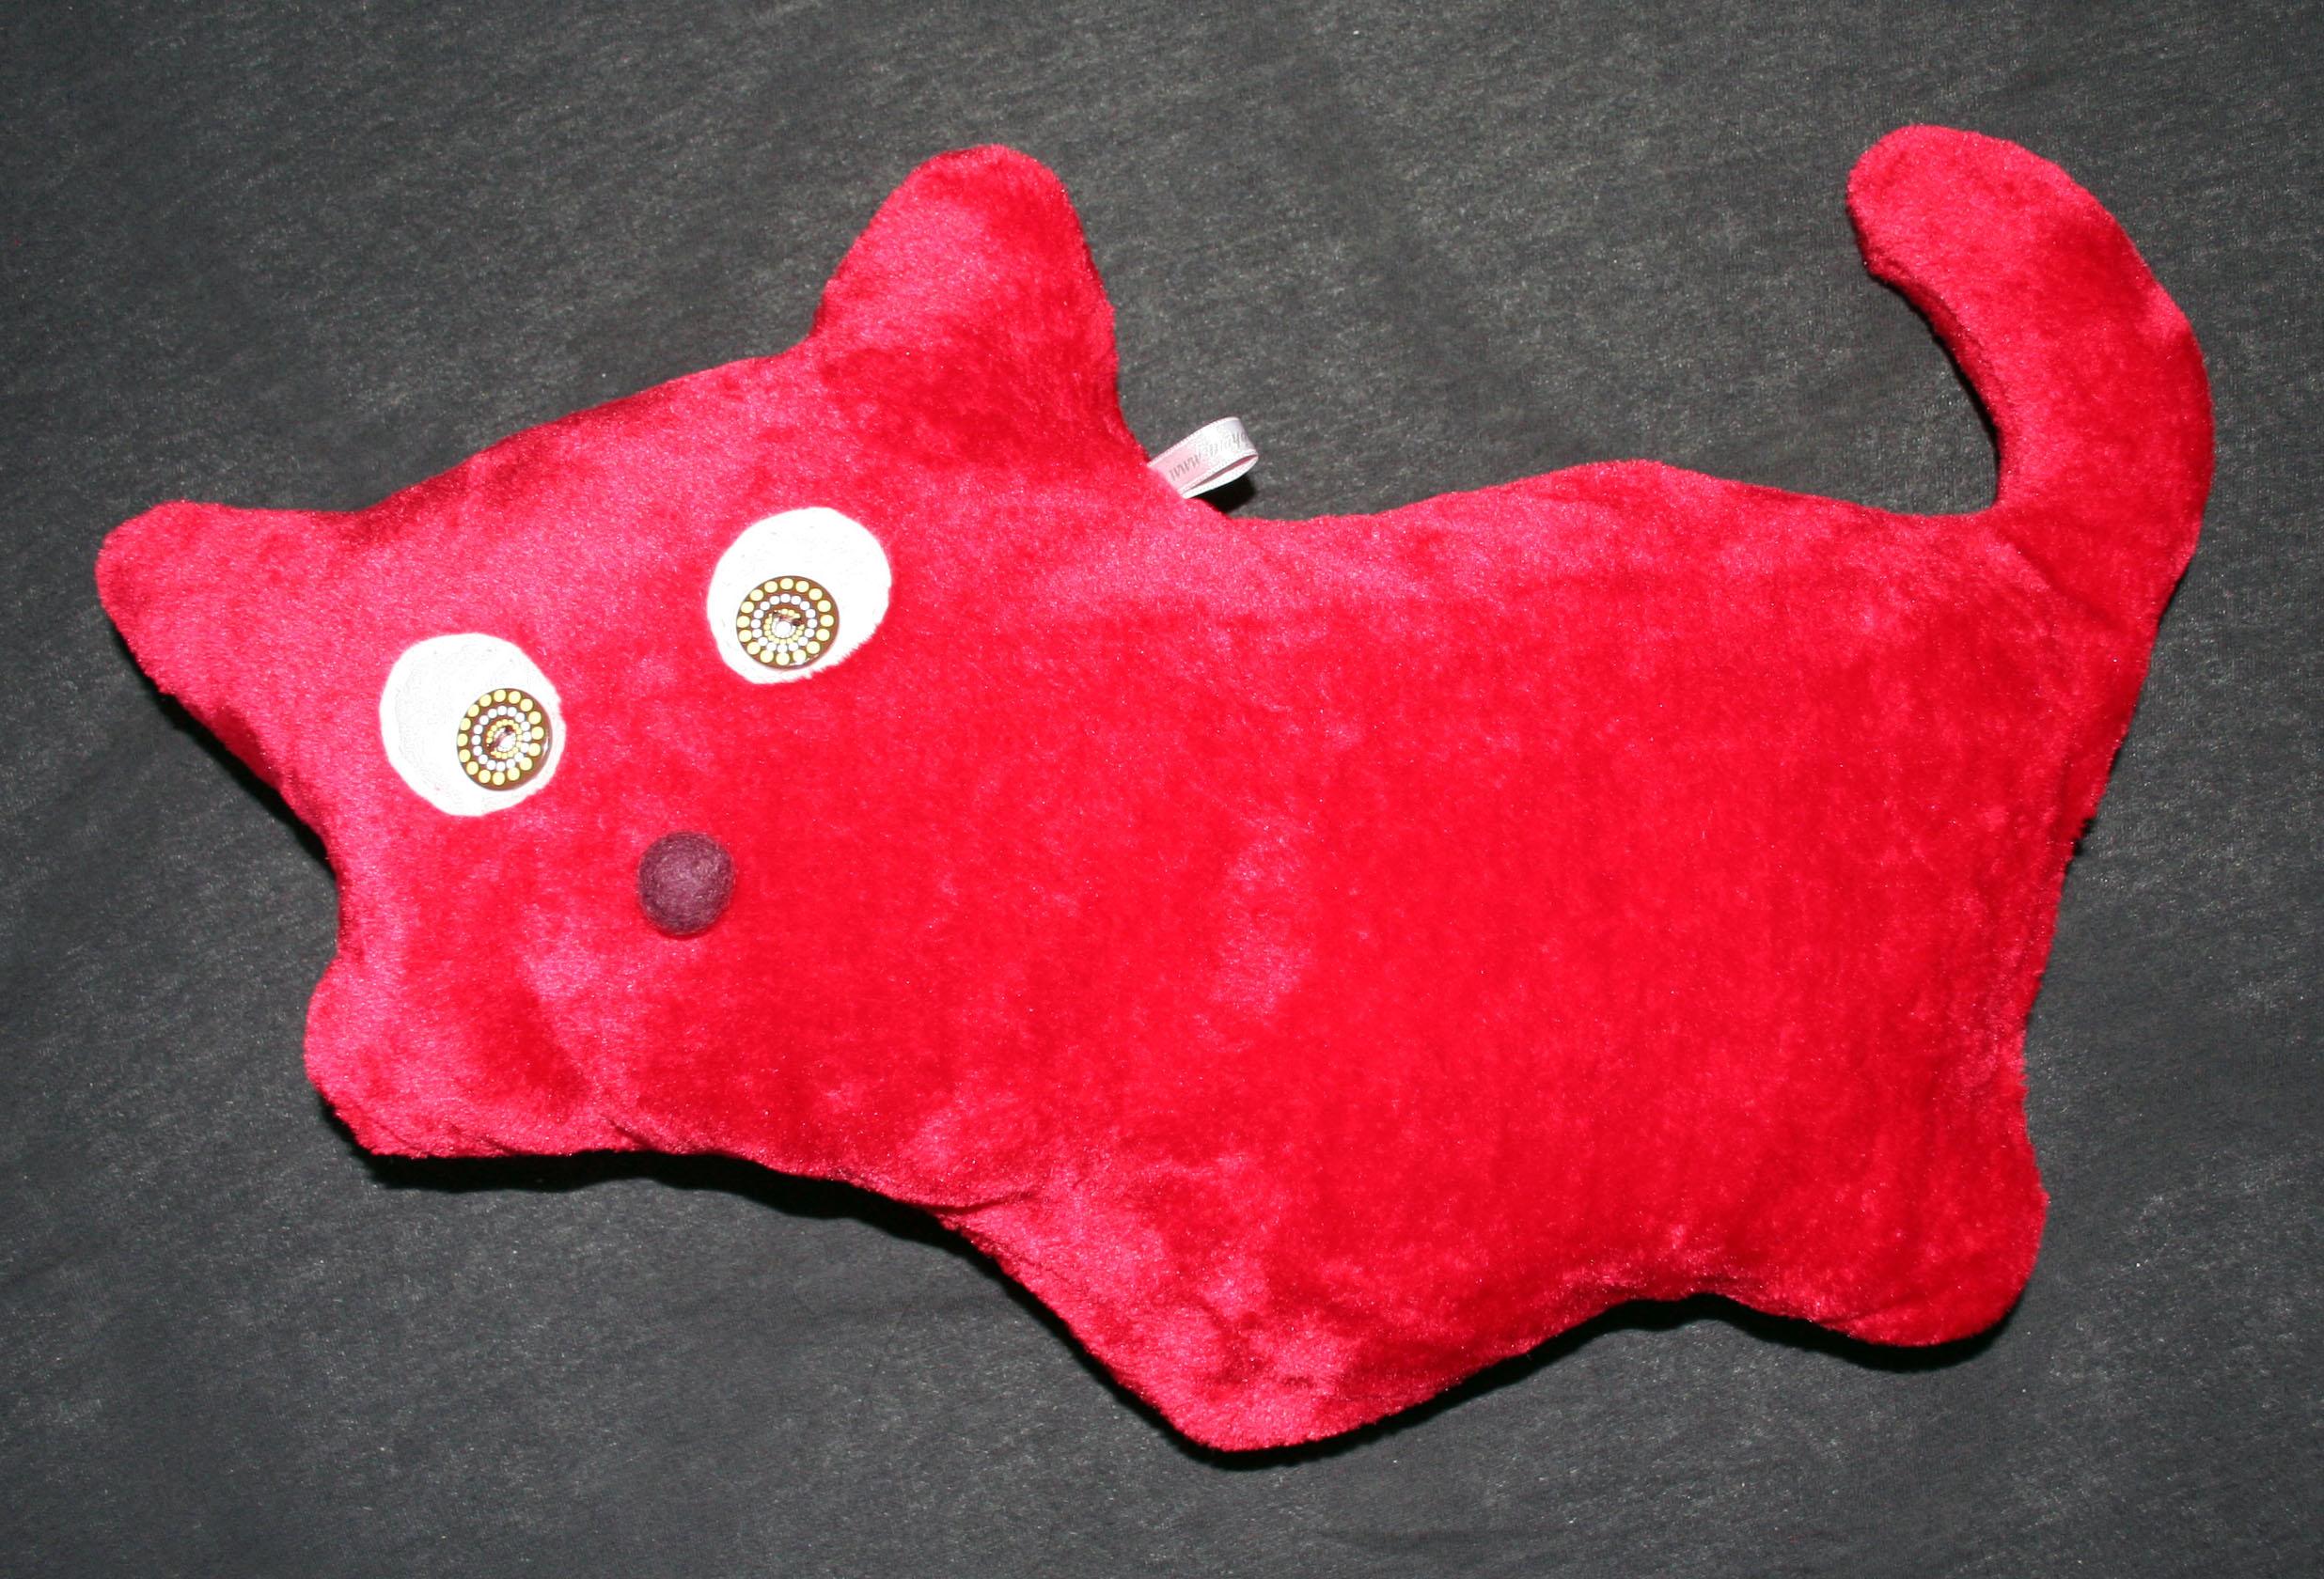 http://www.imaygine.com/wp-content/uploads/2011/12/matourouge.jpg